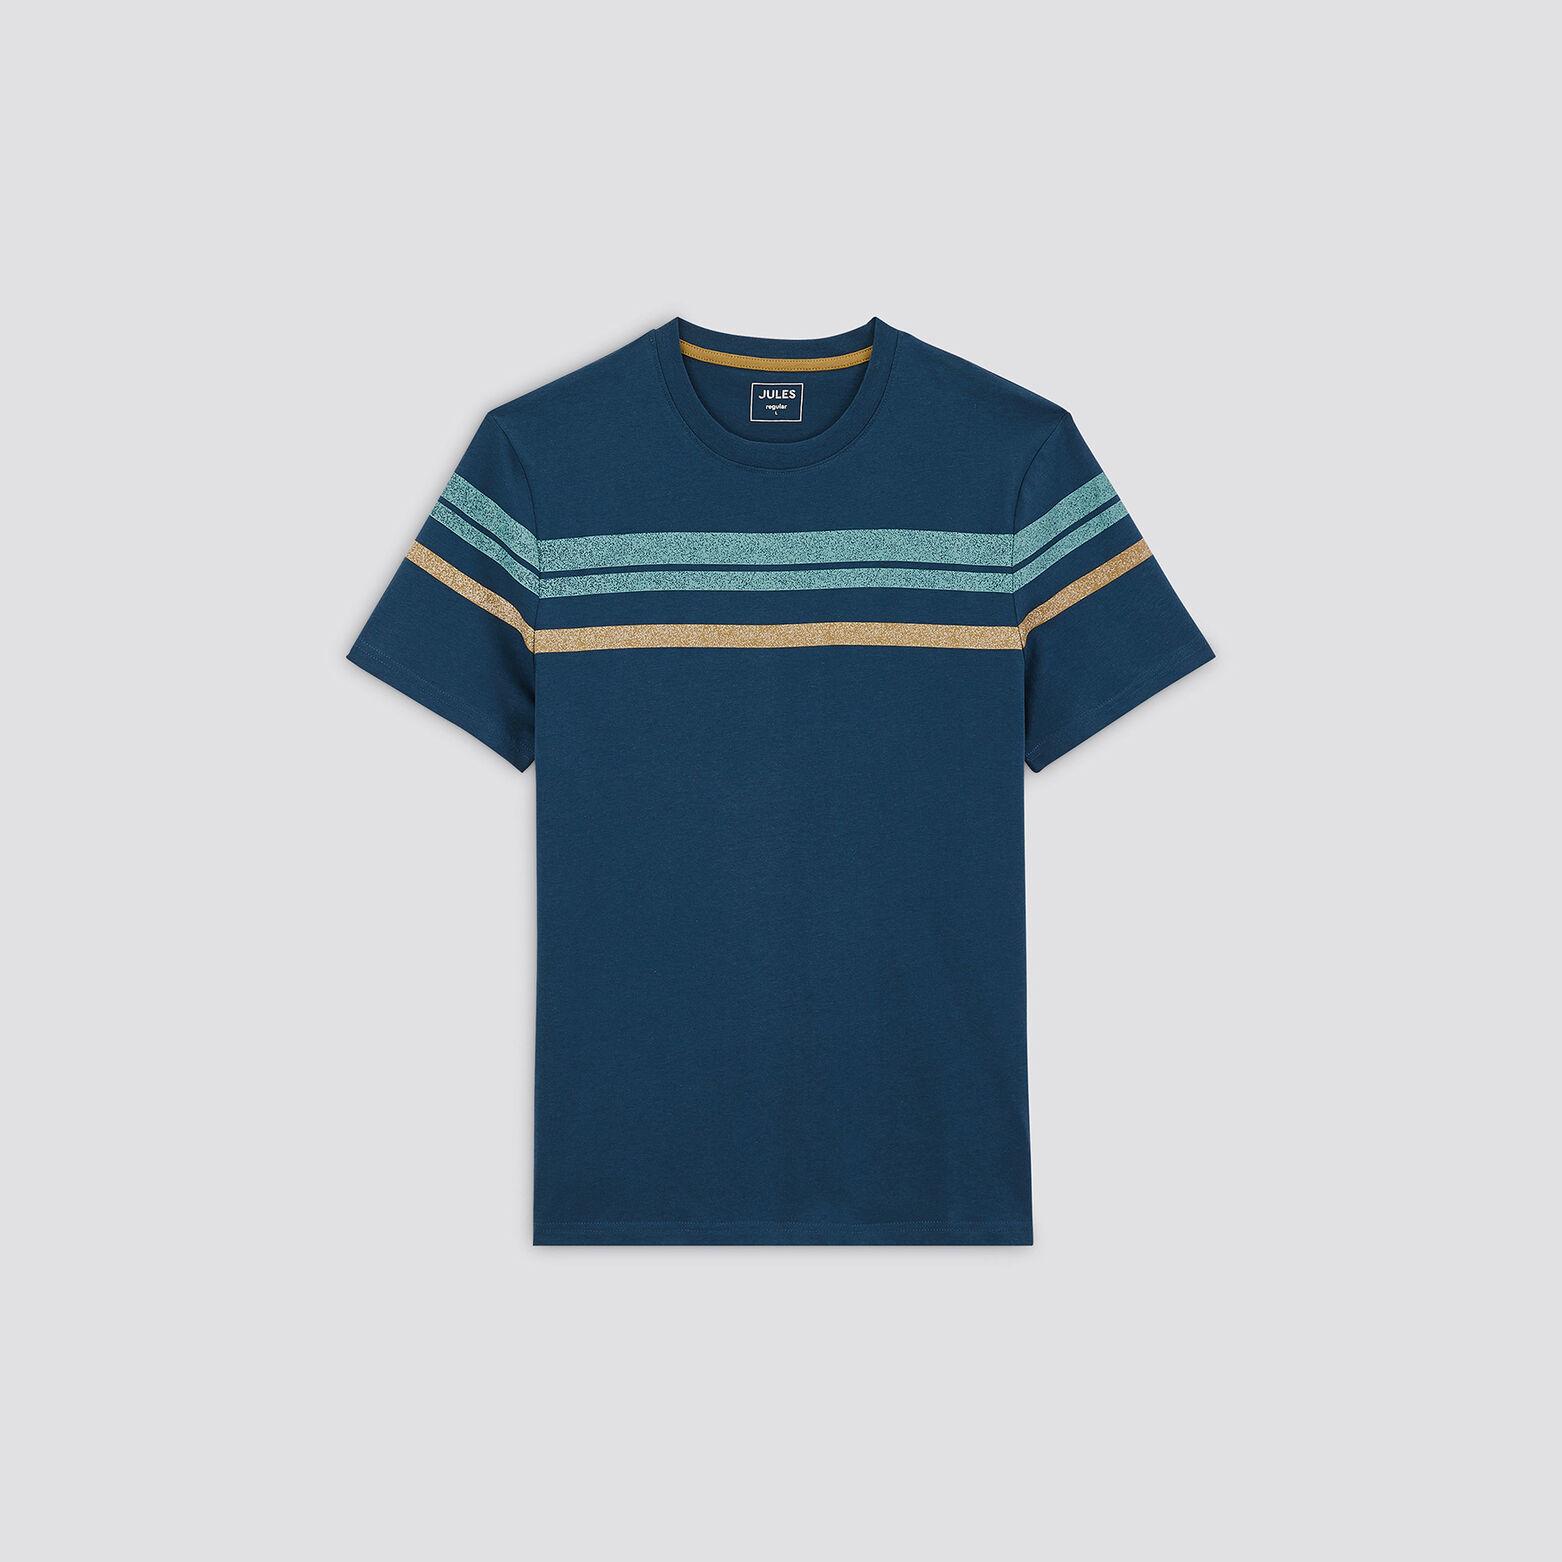 Tee-shirt rayures contrastées coton issu de l'agri